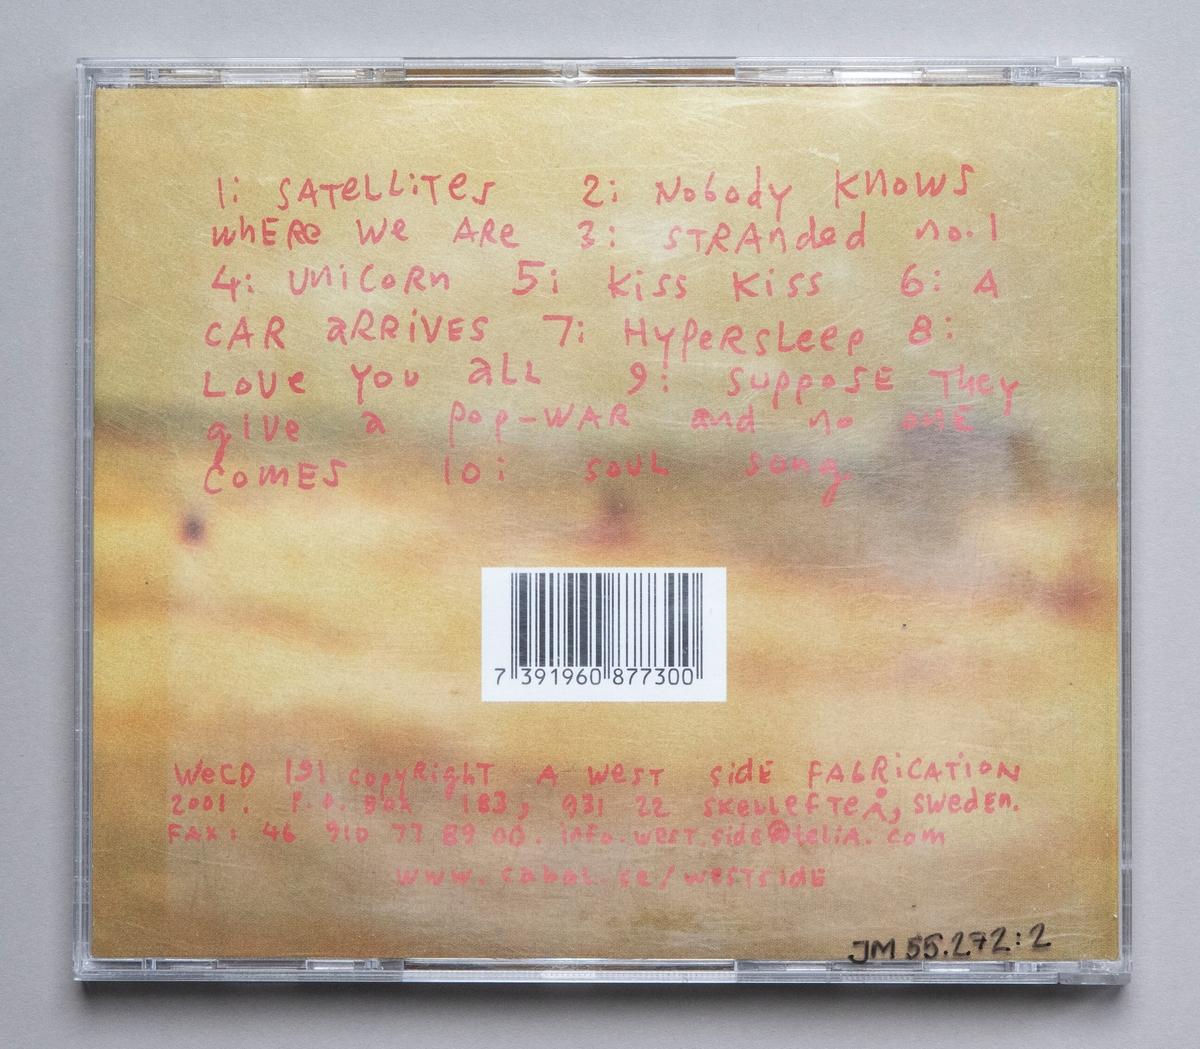 CD-skiva i tredelat, hårt plastfodral med inlaga i framsidan (vikt pappersark) och i baksidan.  Innehåll: 1. Satellites 2. Nobody Knows Where We Are 3. Strandes no. 1 4. Unicorn 5. Kiss Kiss 6. A Care arrives 7. Hypersleep 8. Love You All 9. Suppose they give a Pop-war and no one comes 10. Soul Song  JM 55272:1, Skiva JM 55272:2, Fodral JM 55272:3, Inlaga